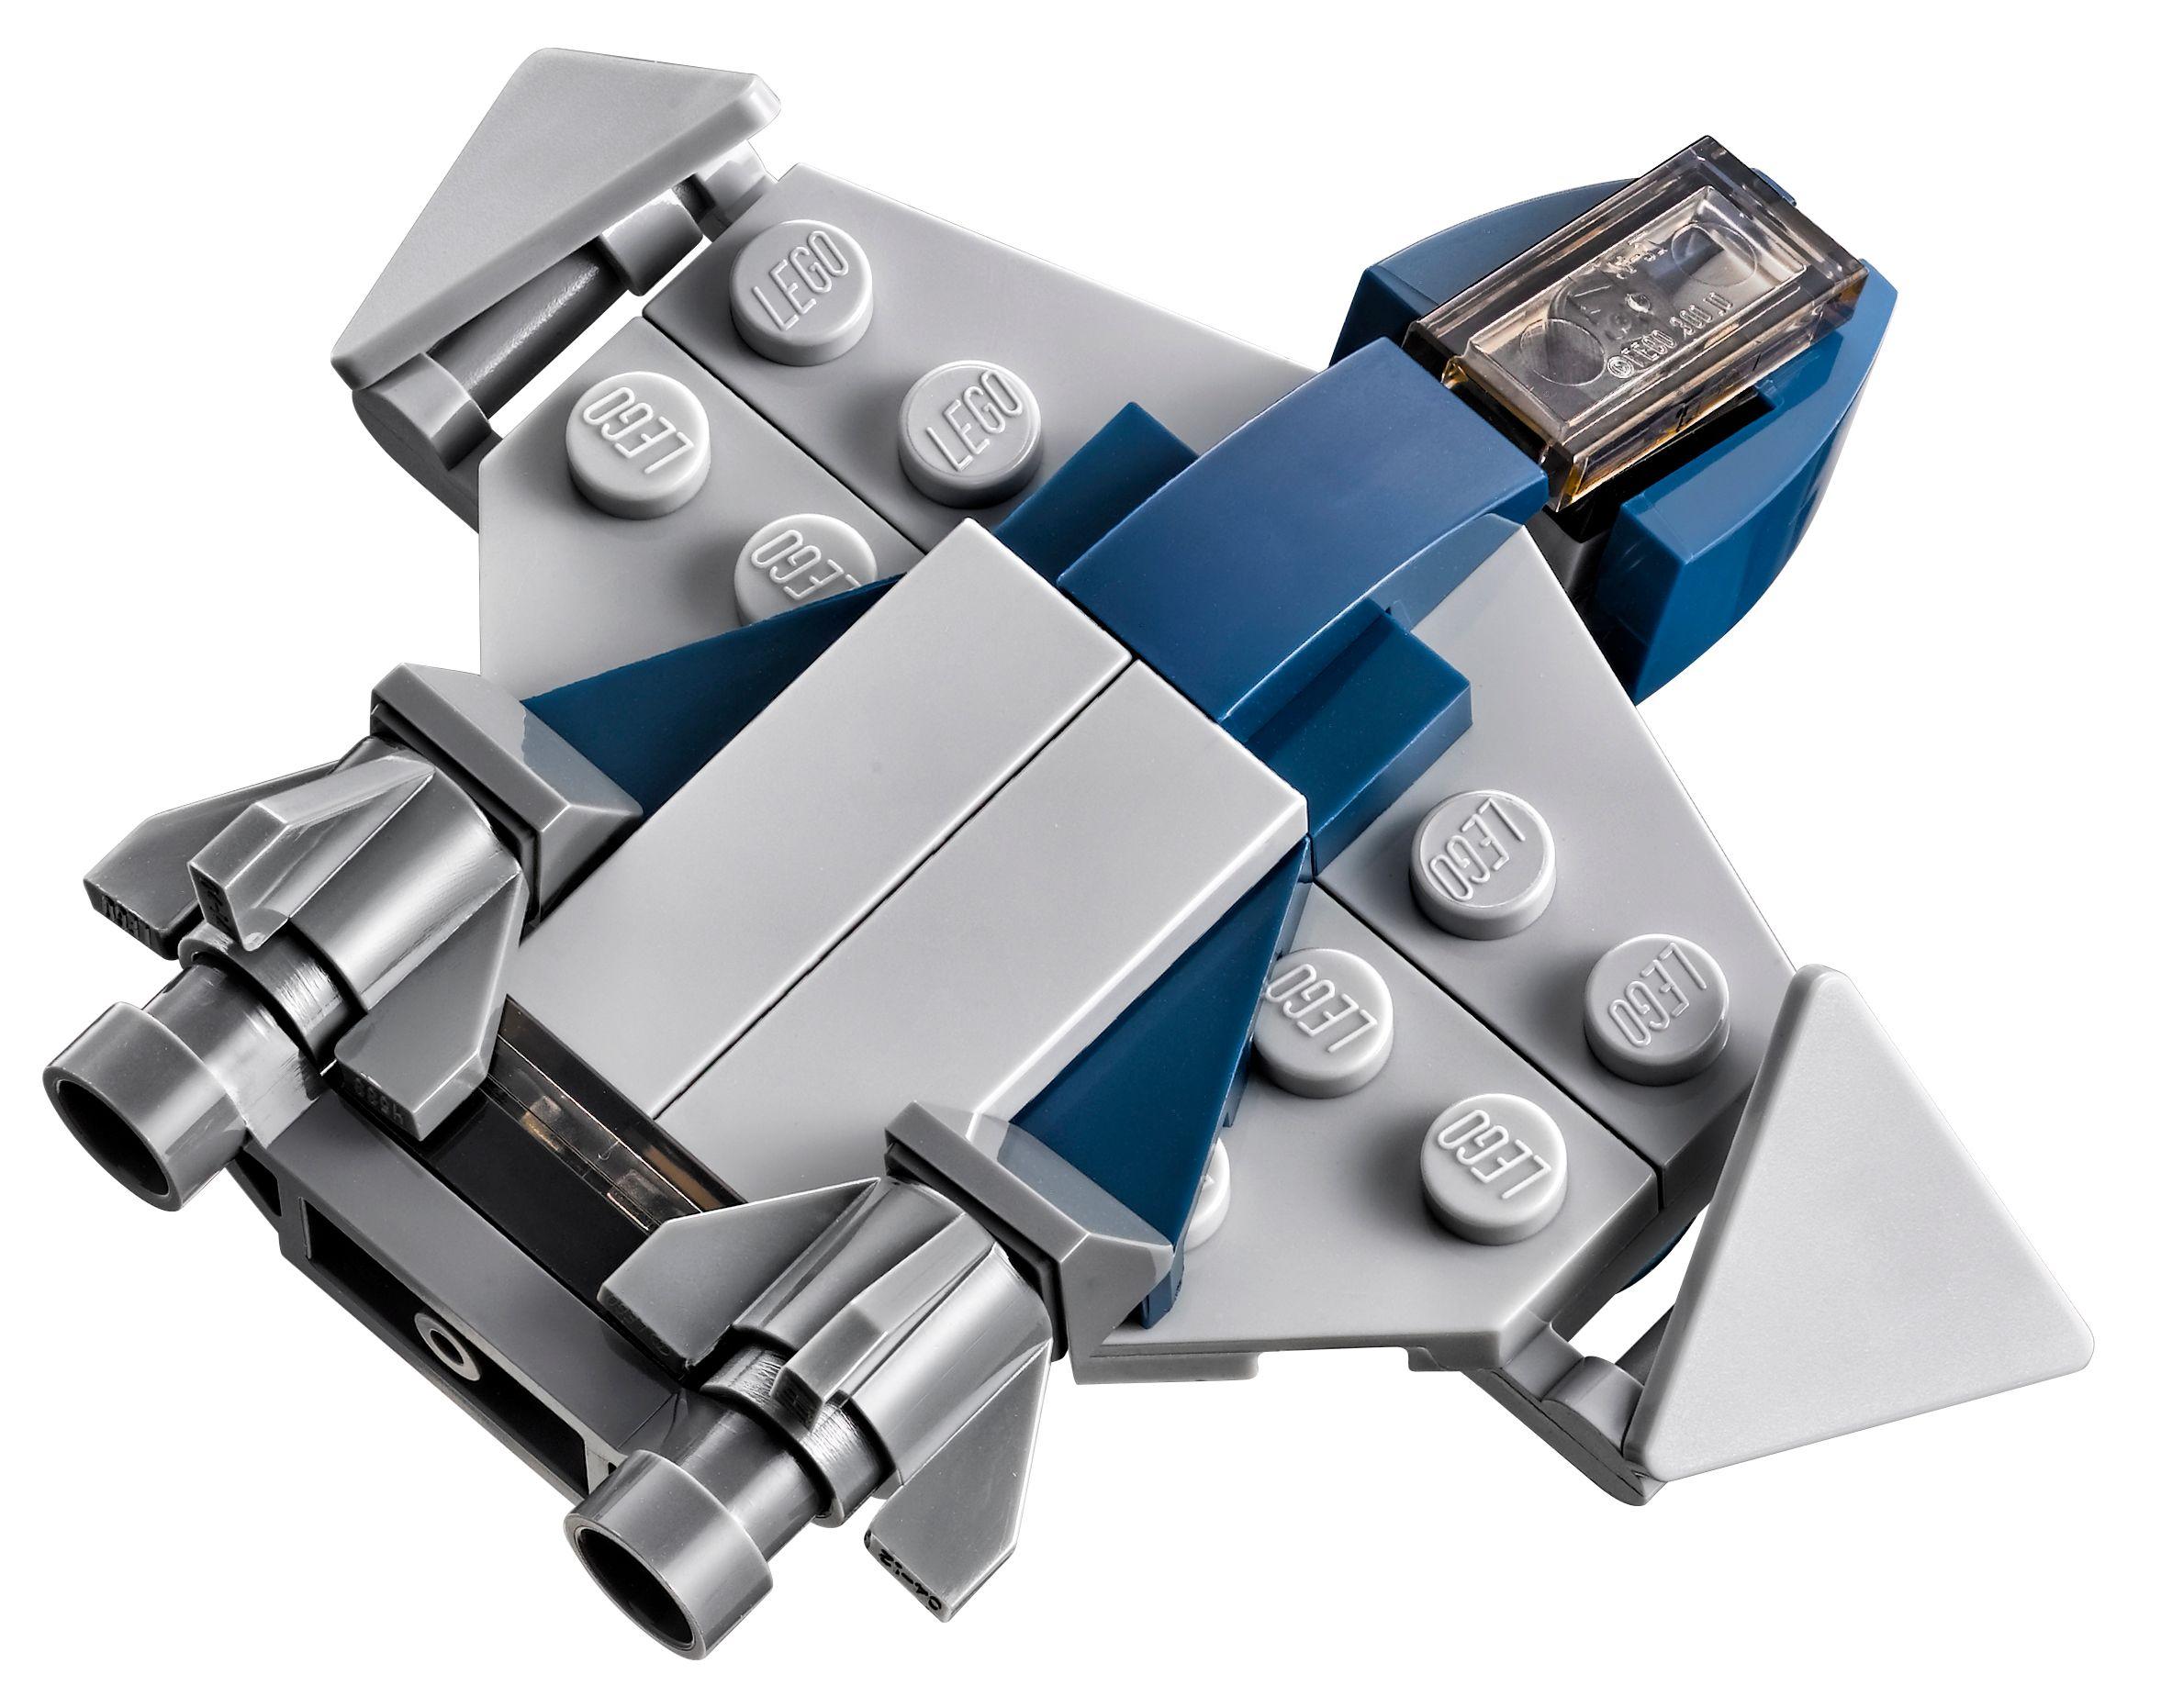 Lego Helicarrier Avengers Image 5